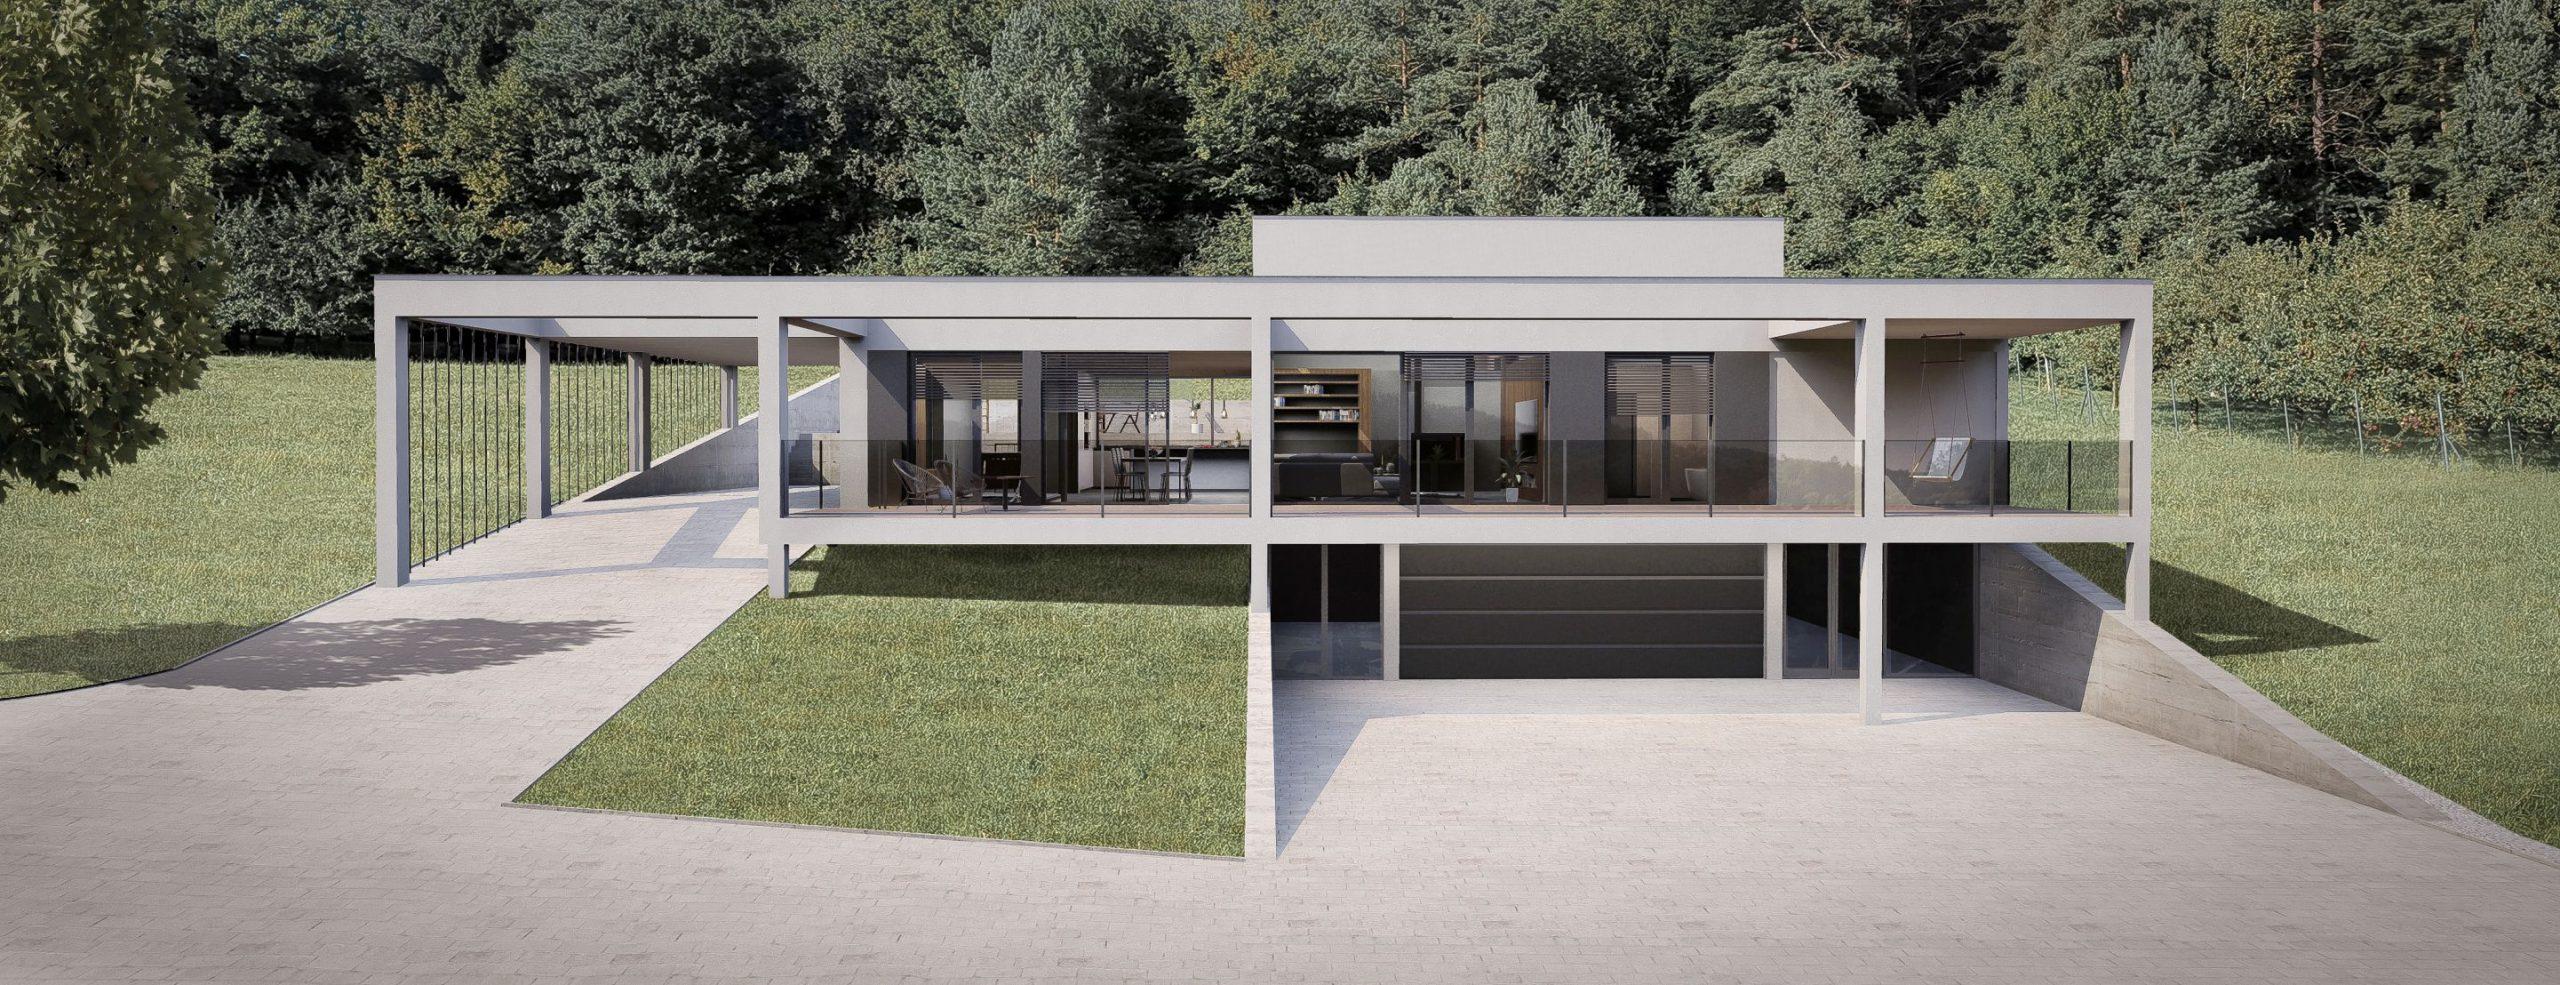 01-Puchov-rezidencne-rodinna-vila-exterier-vizualizacia-les-optim